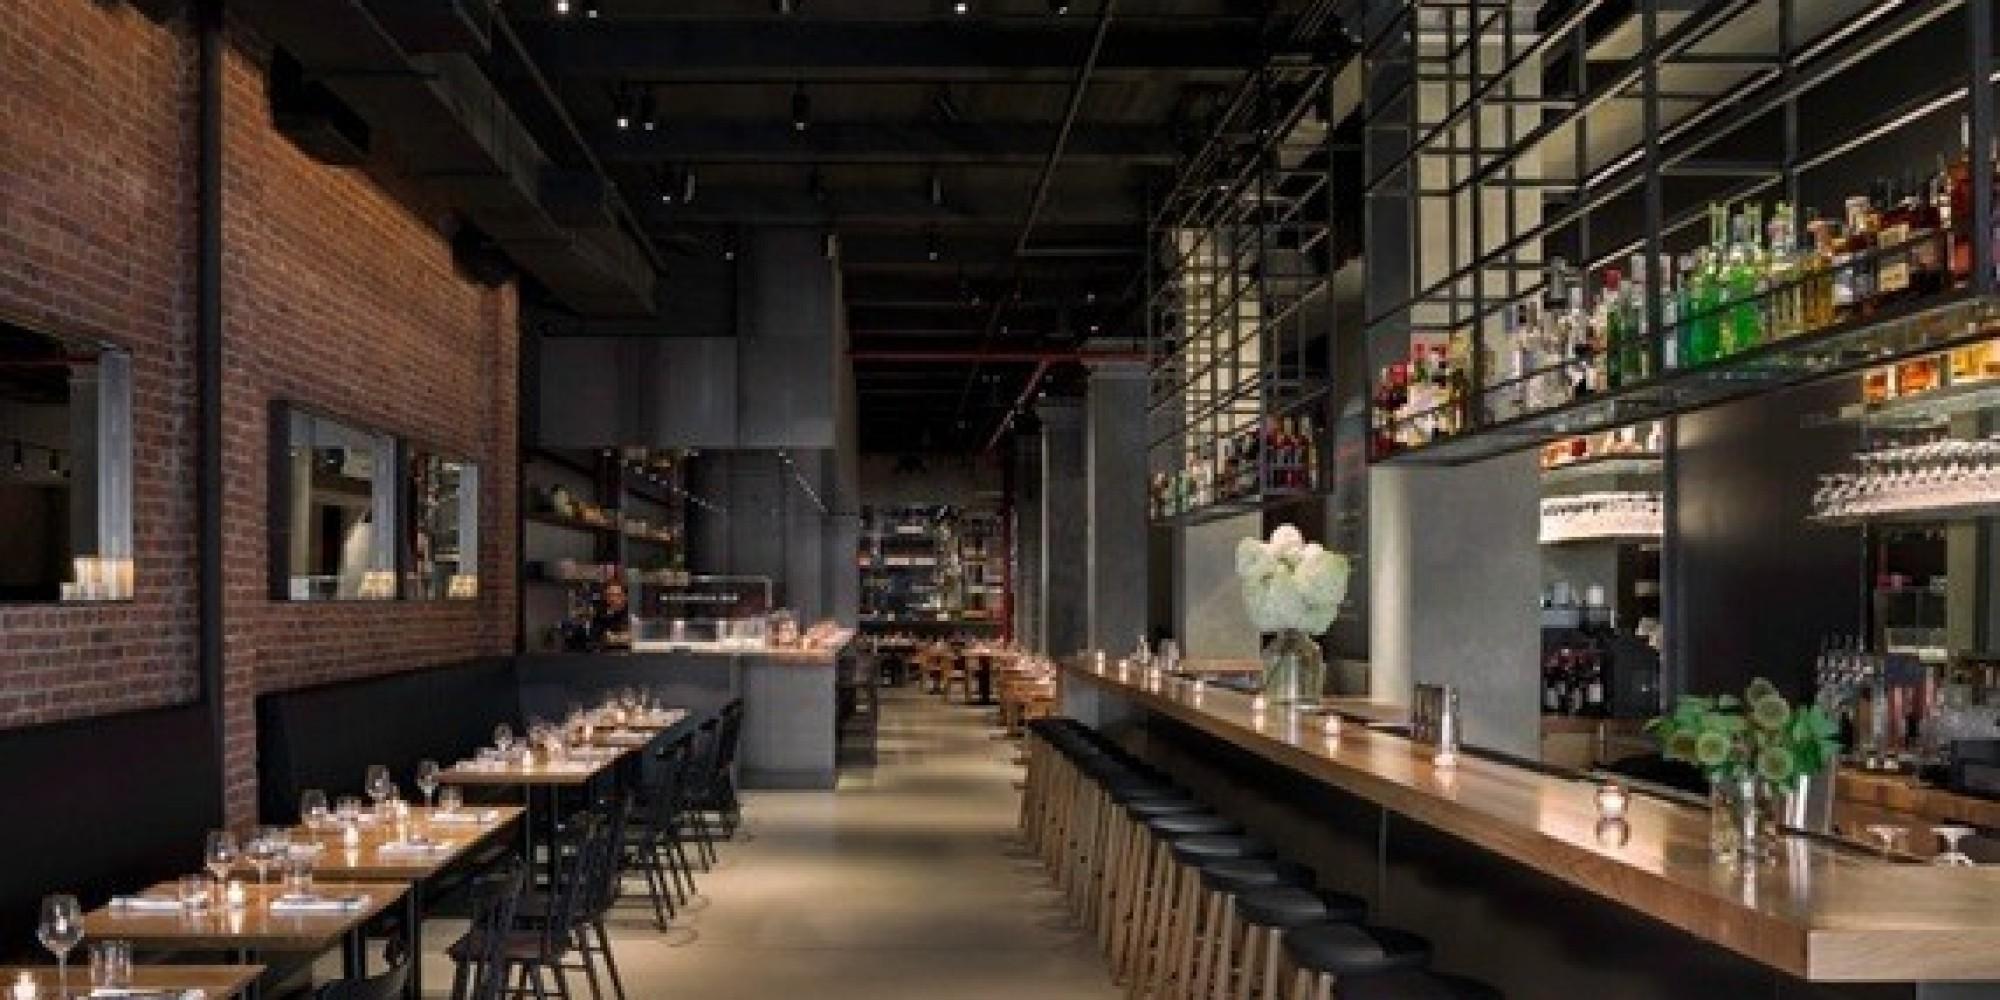 obic u00e0 opens mozzarella bar flagship in nyc u0026 39 s flatiron